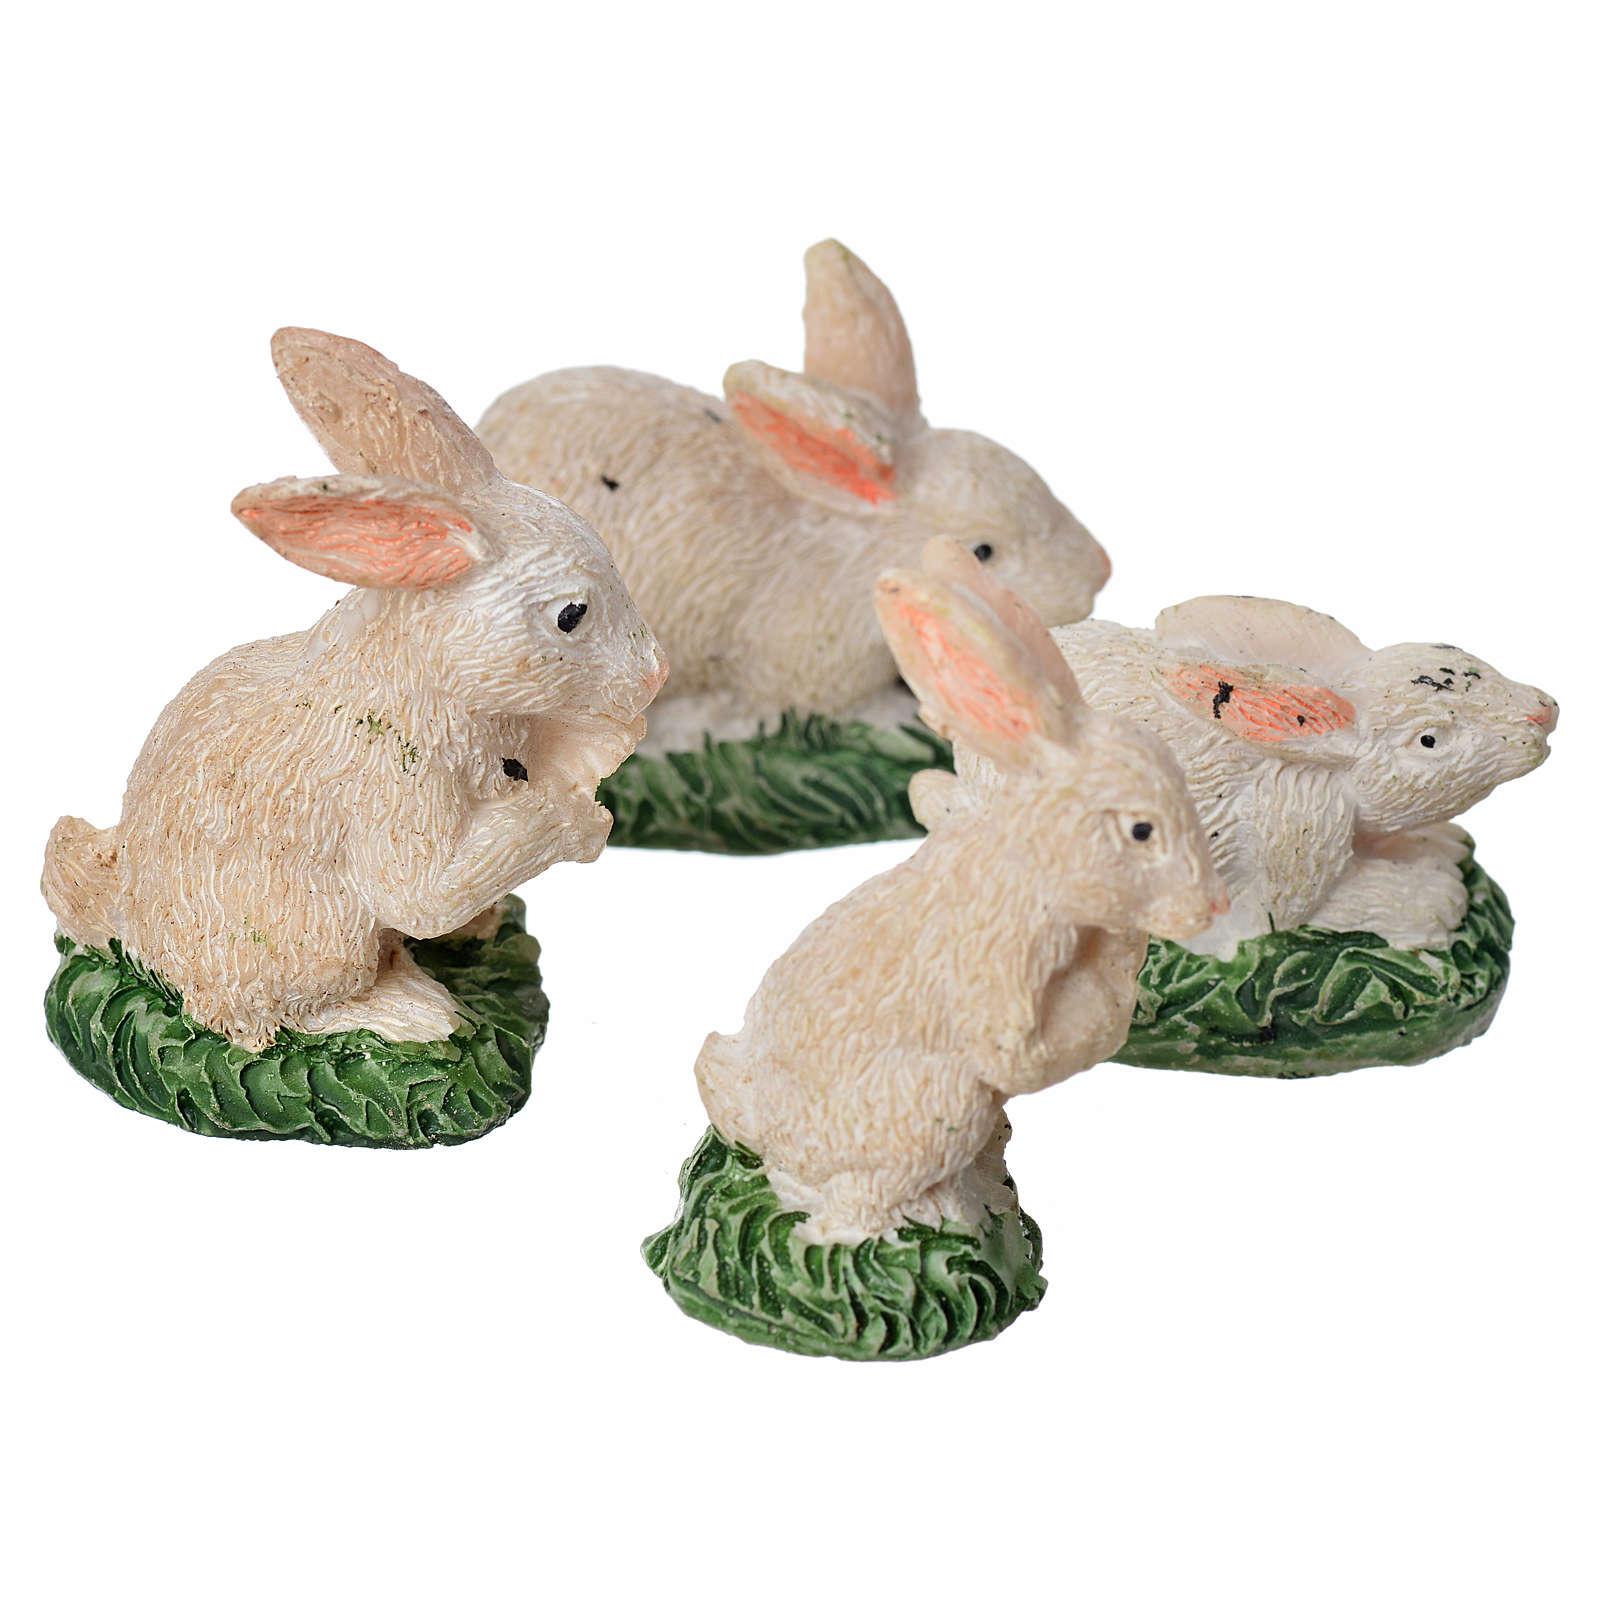 Nativity figurine, resin rabbits, 4 pieces 10cm 3